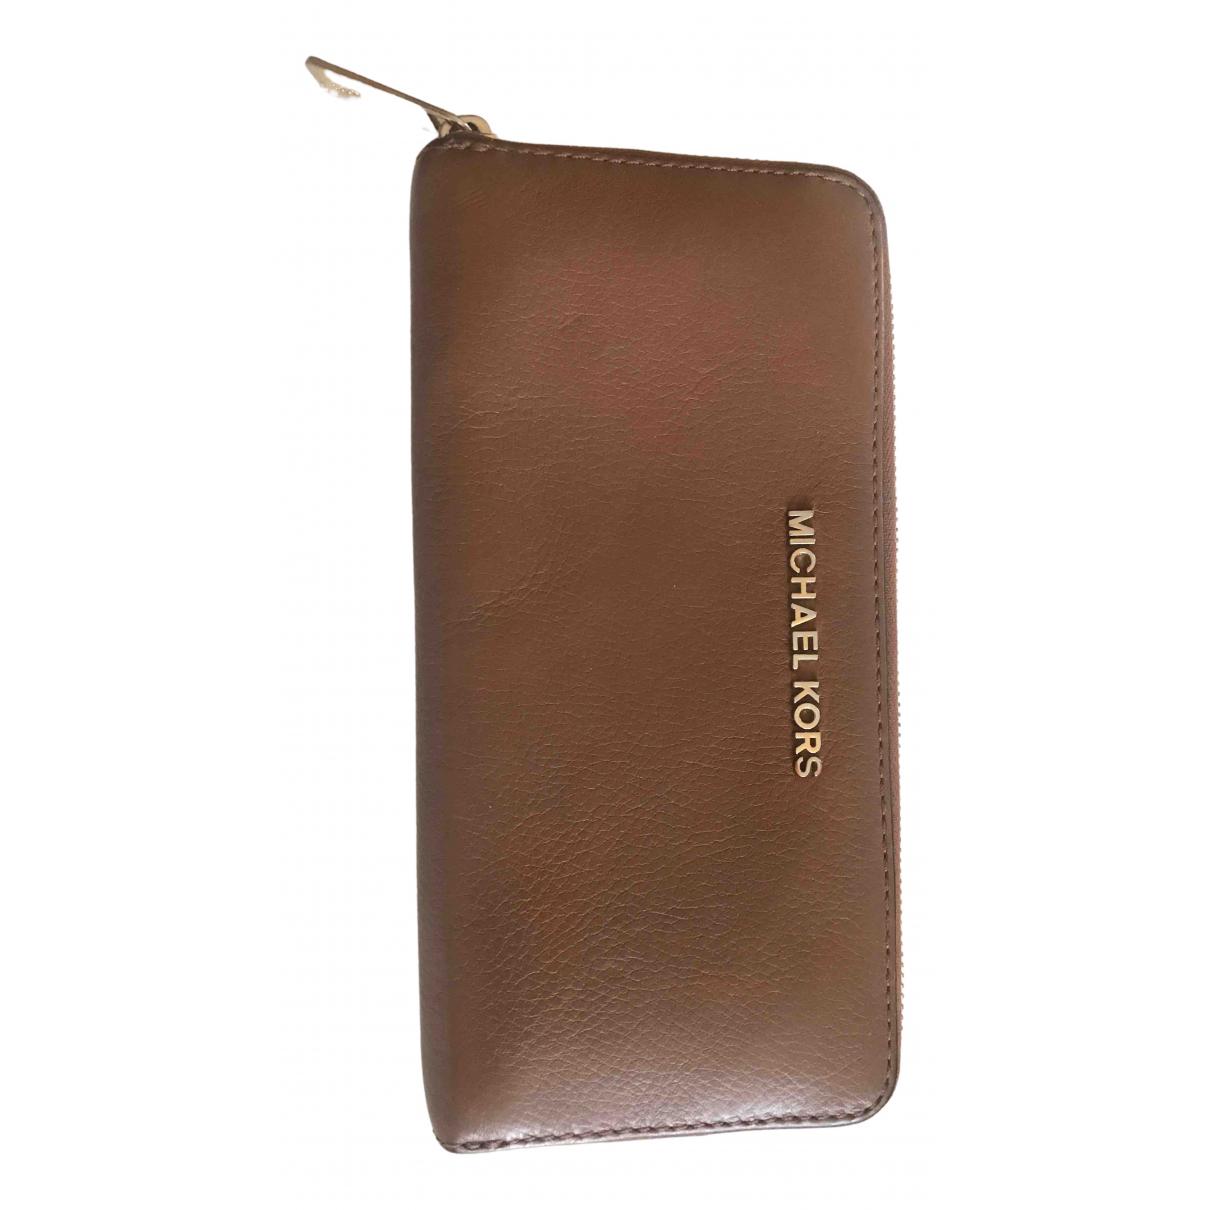 Michael Kors \N Camel Leather wallet for Women \N